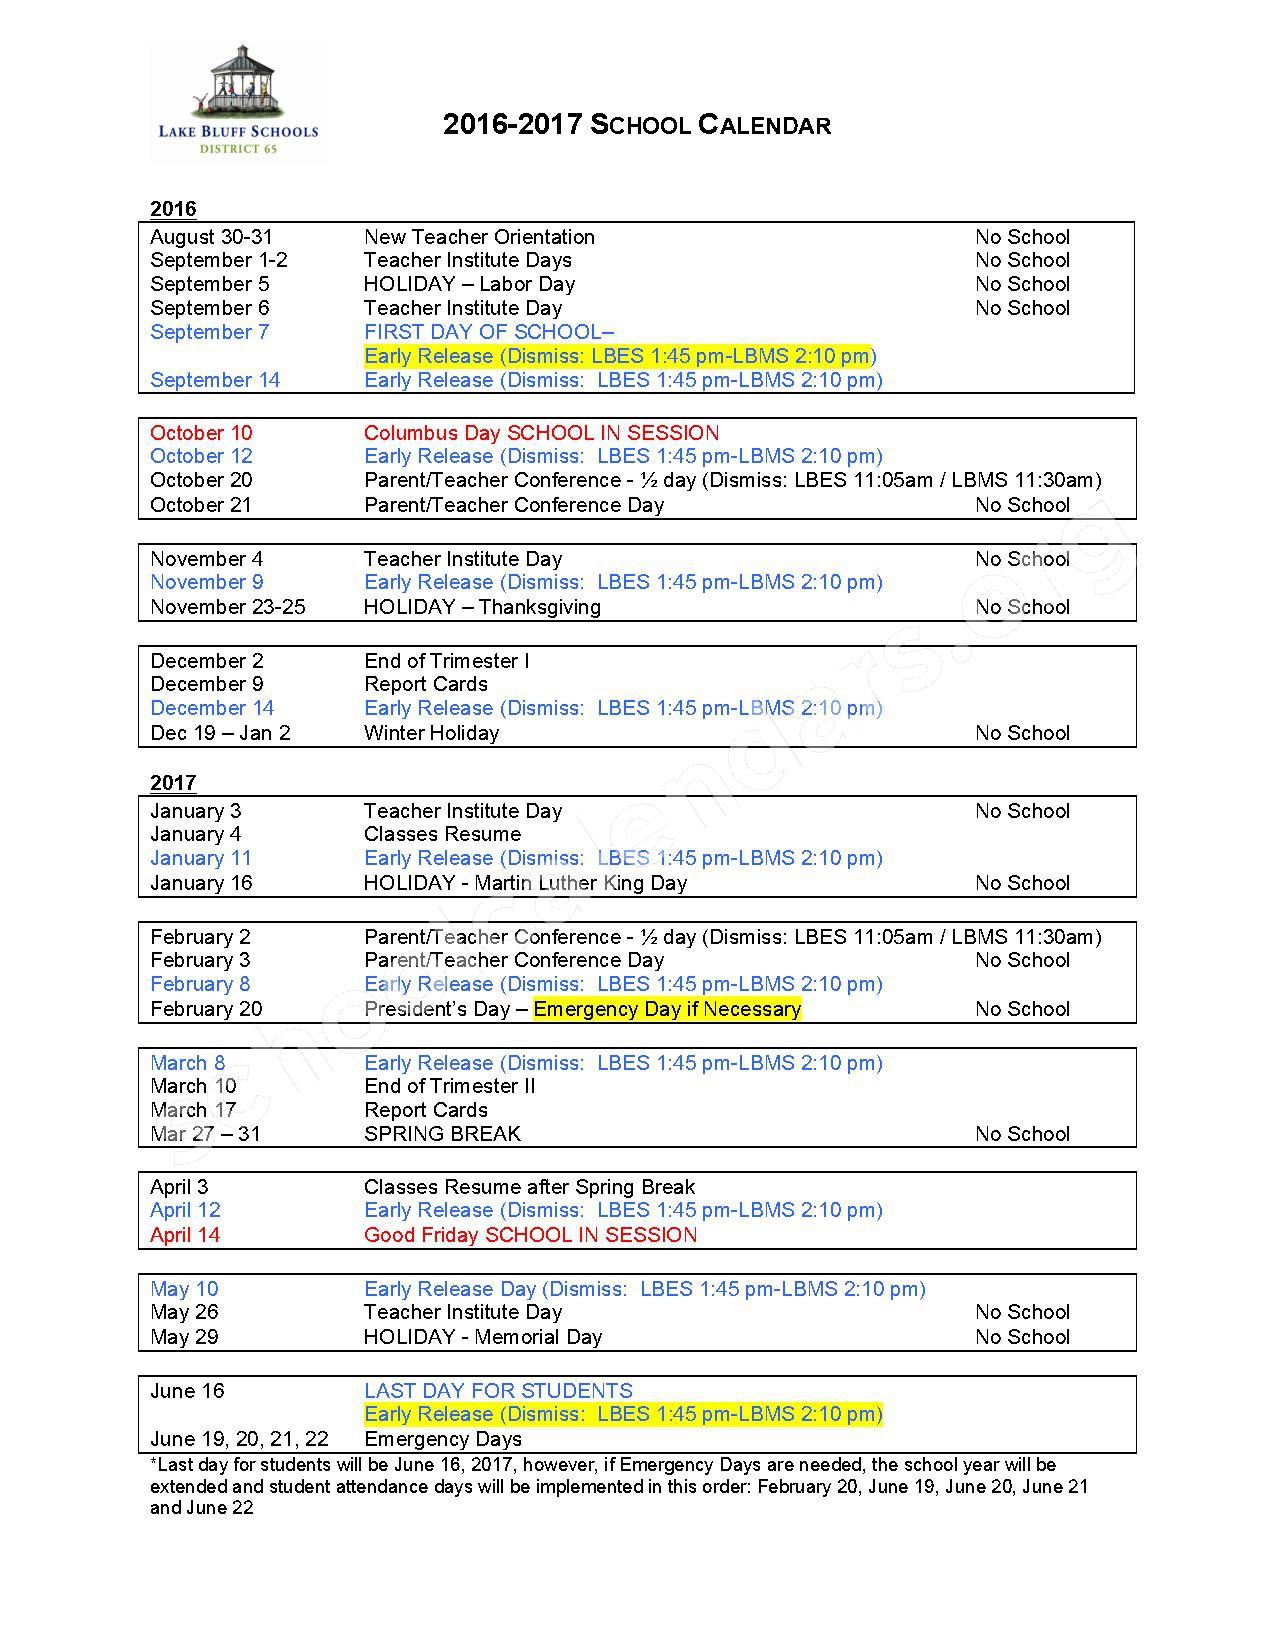 2016 - 2017 School Calendar – Lake Bluff Elementary School District 65 – page 1